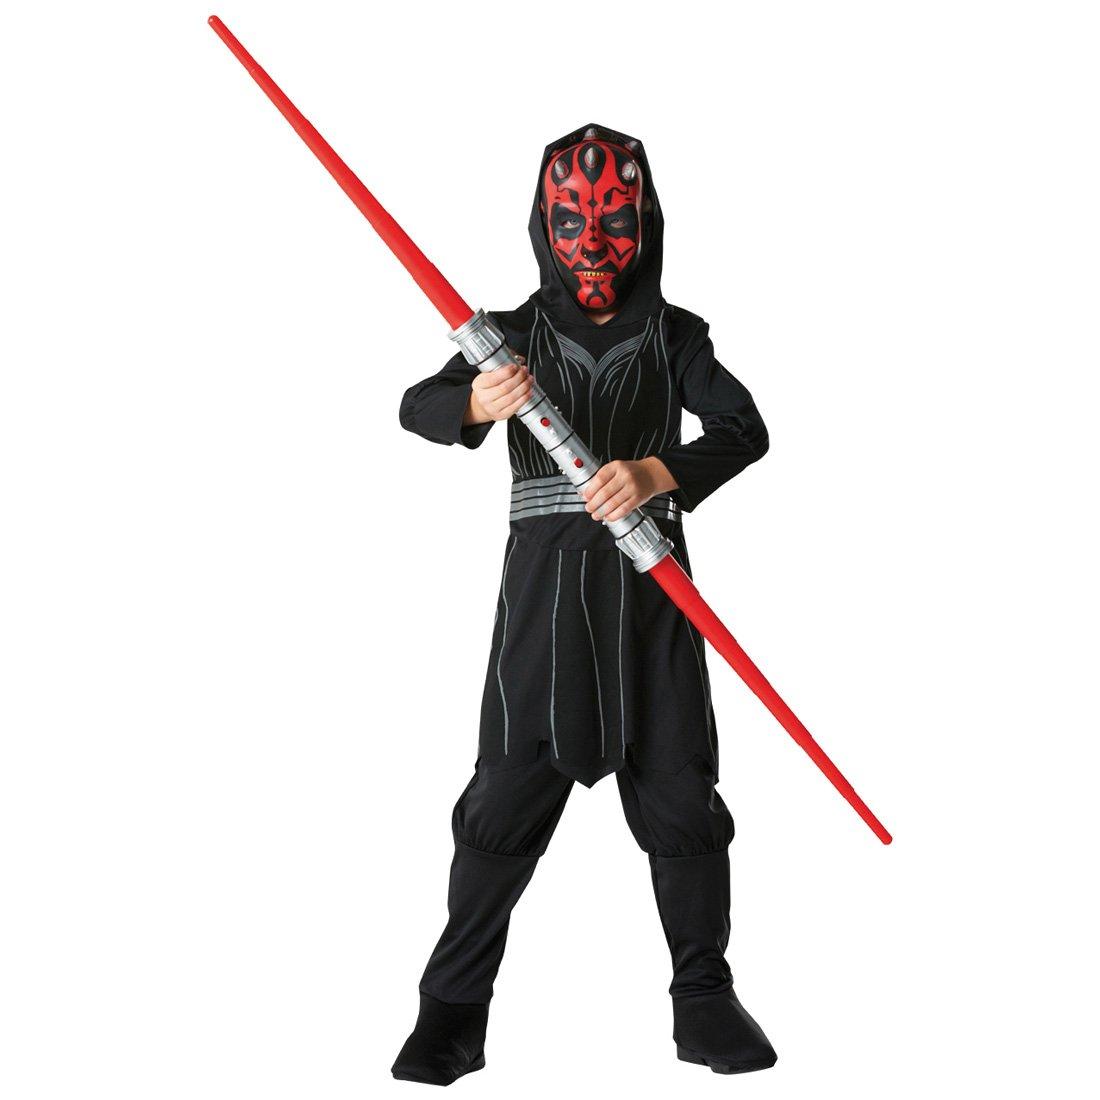 Kinder Kostüm Darth Darth Darth Maul Starwars Sith Lord Kinderkostüm Star Wars Filmkostüm Jediritter Gegner M 5-6 Jahre 972458